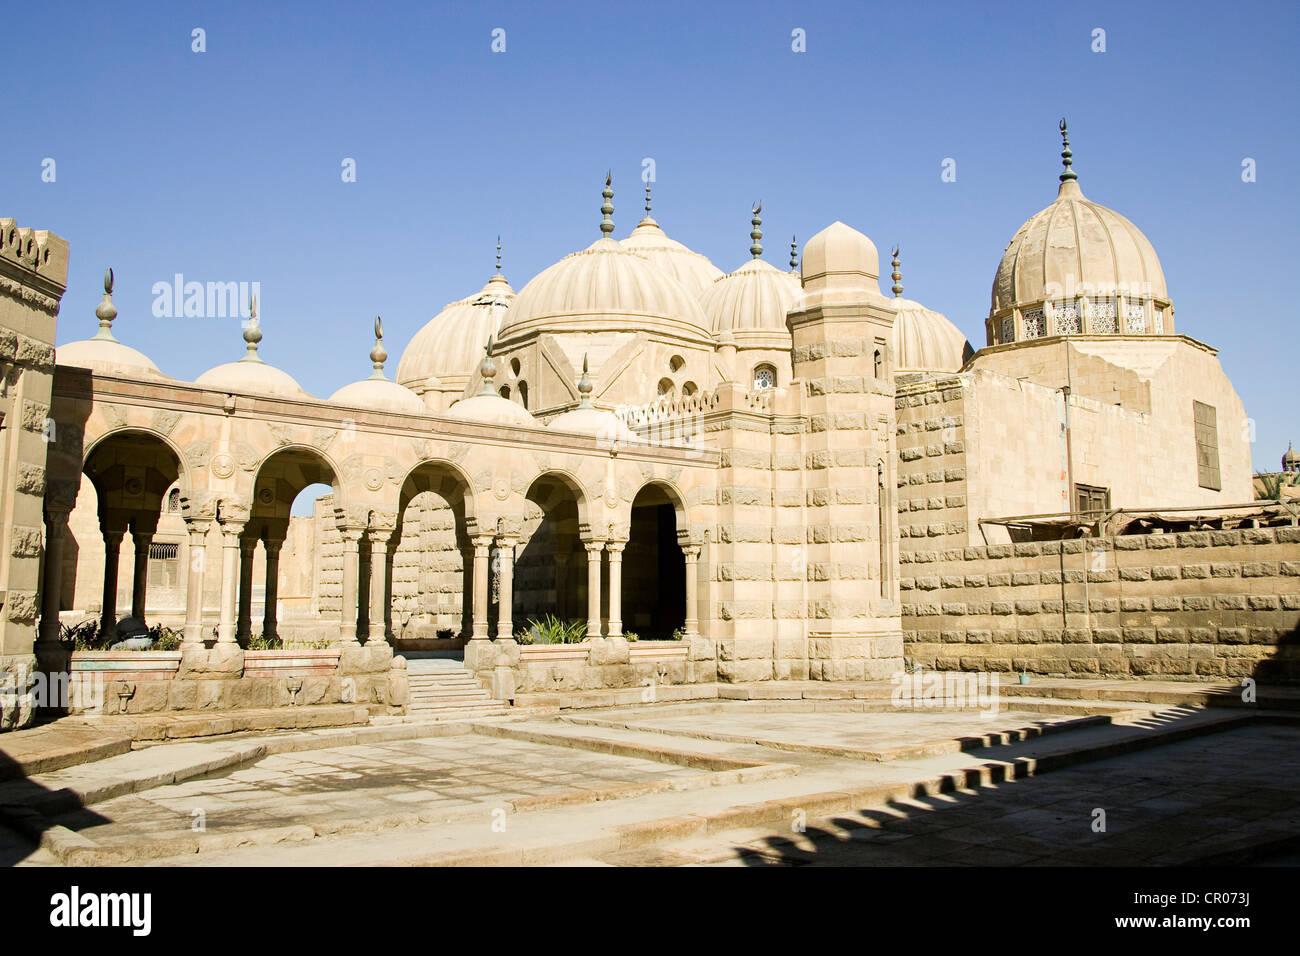 Egypt, Cairo, City of the Dead, Hoch el Bacha Mausoleum - Stock Image